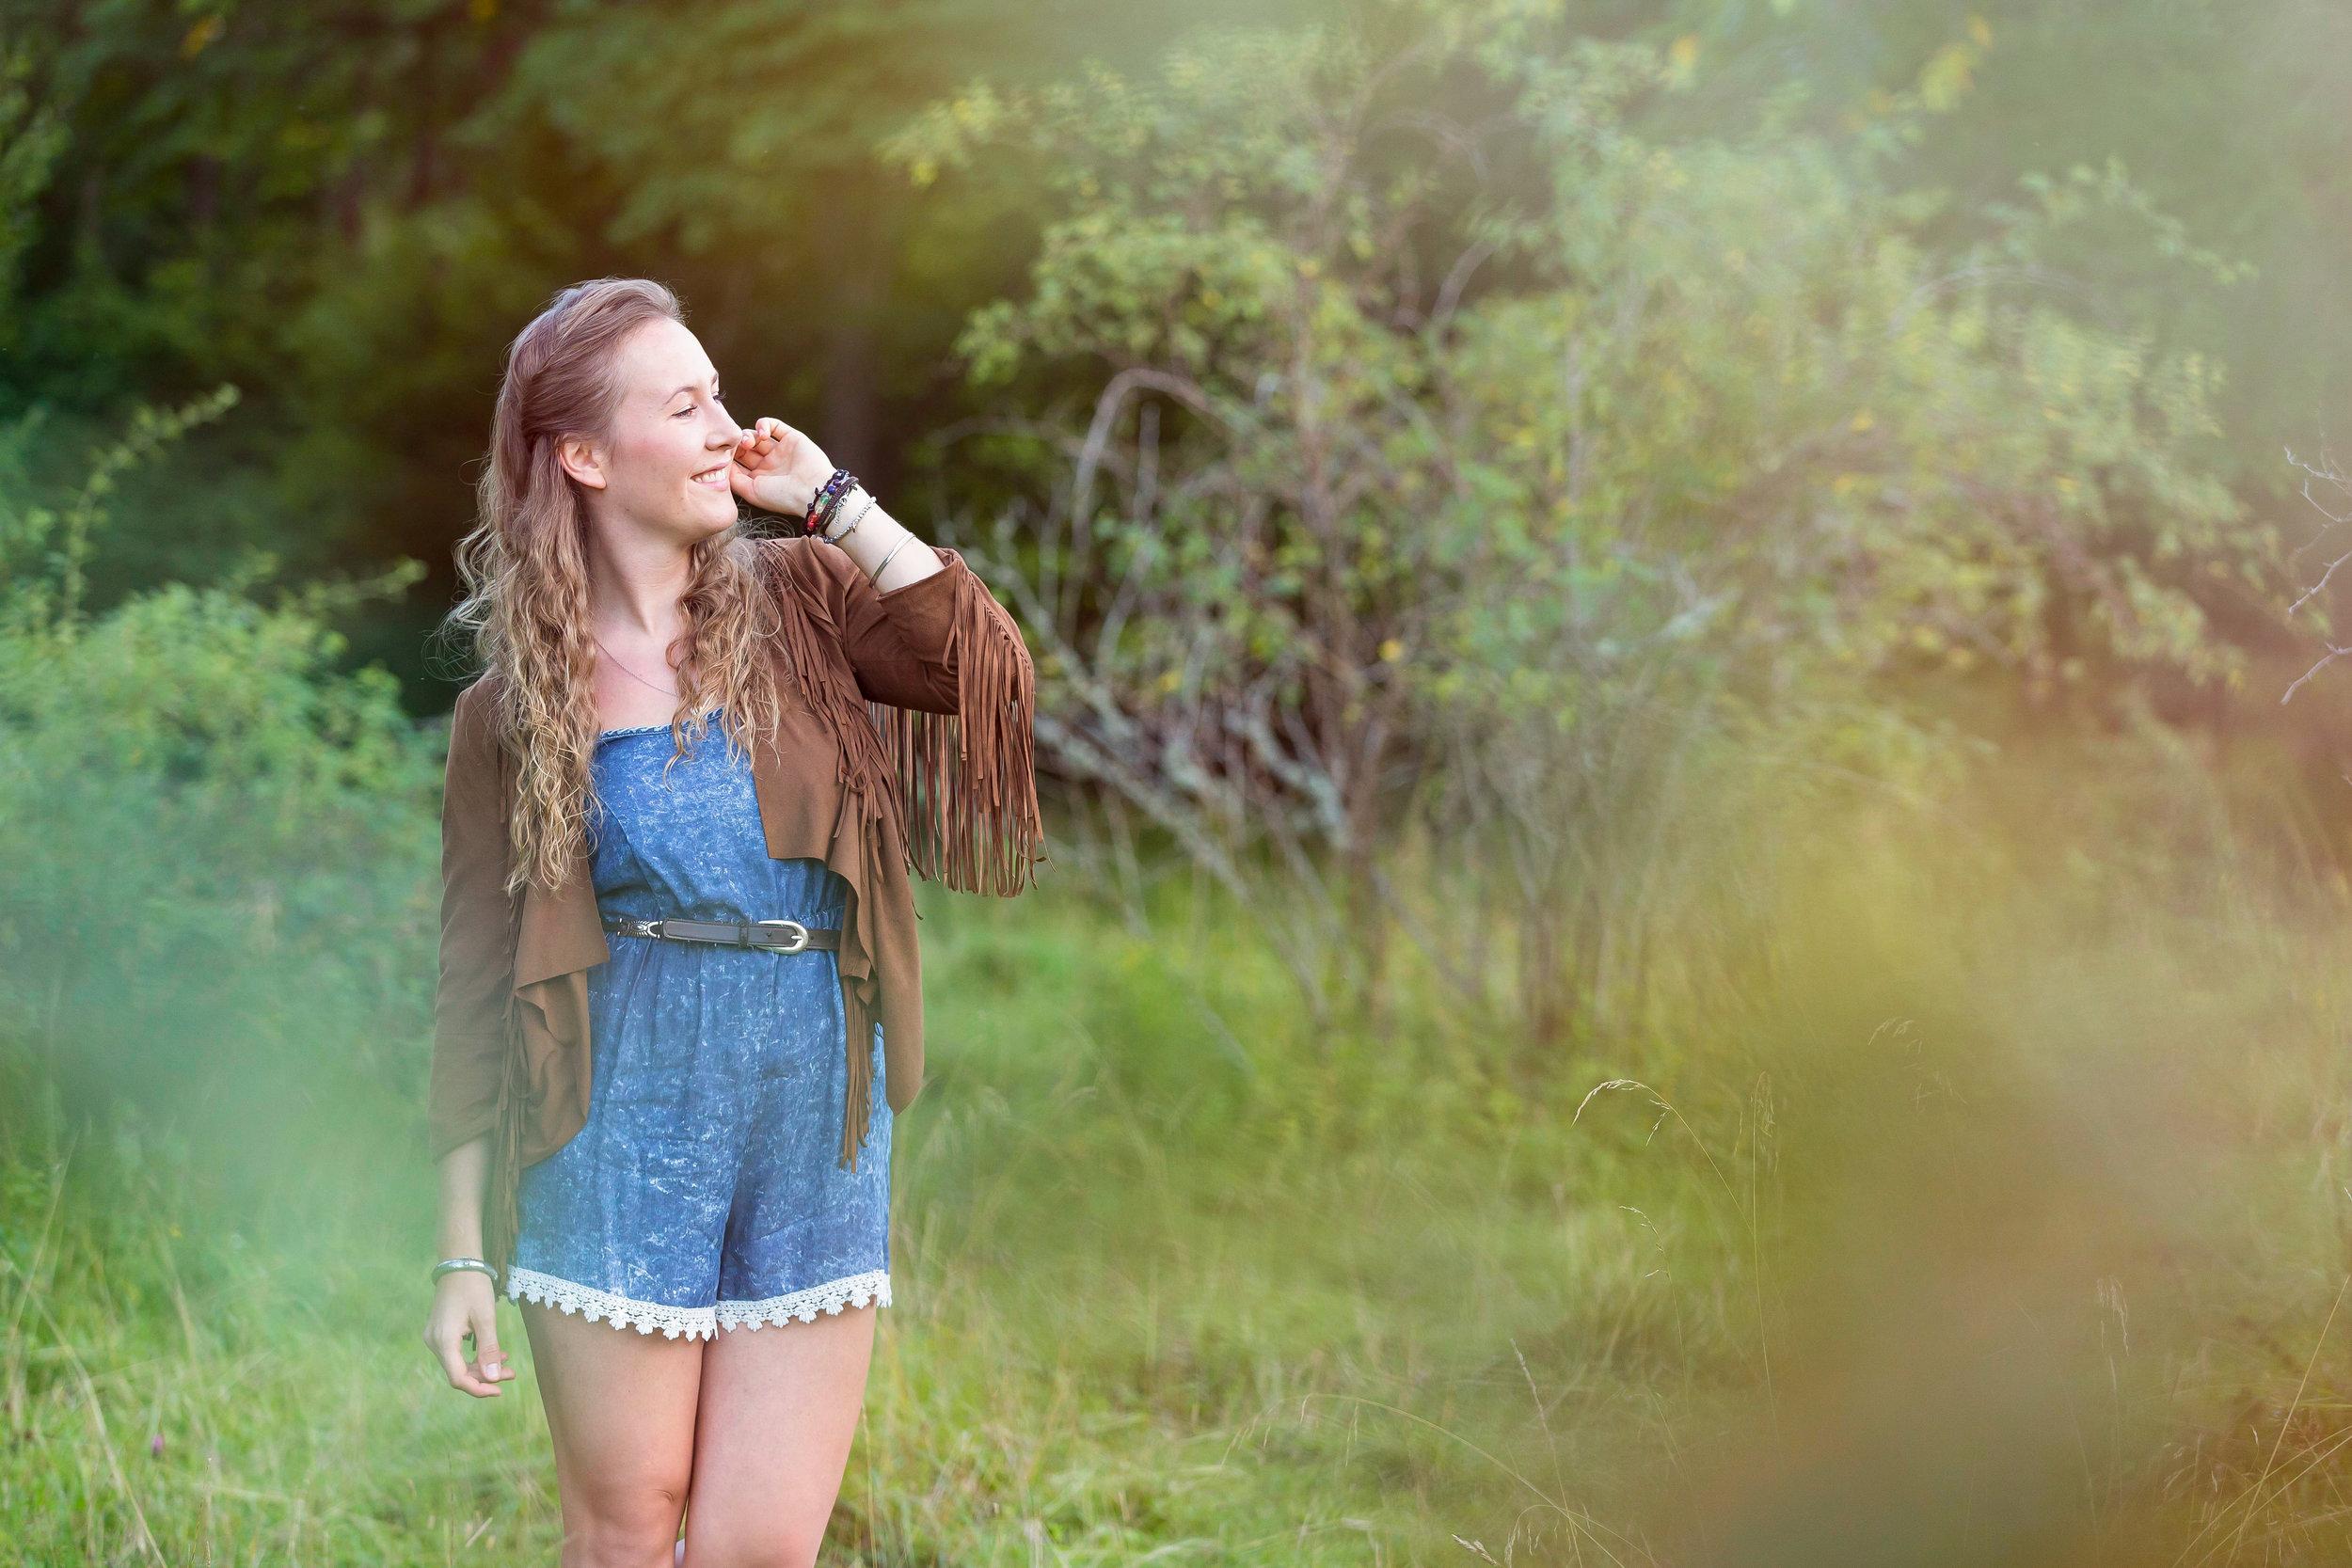 Mikaela-Nalgard-foto-tuana-20160815-0349.jpg